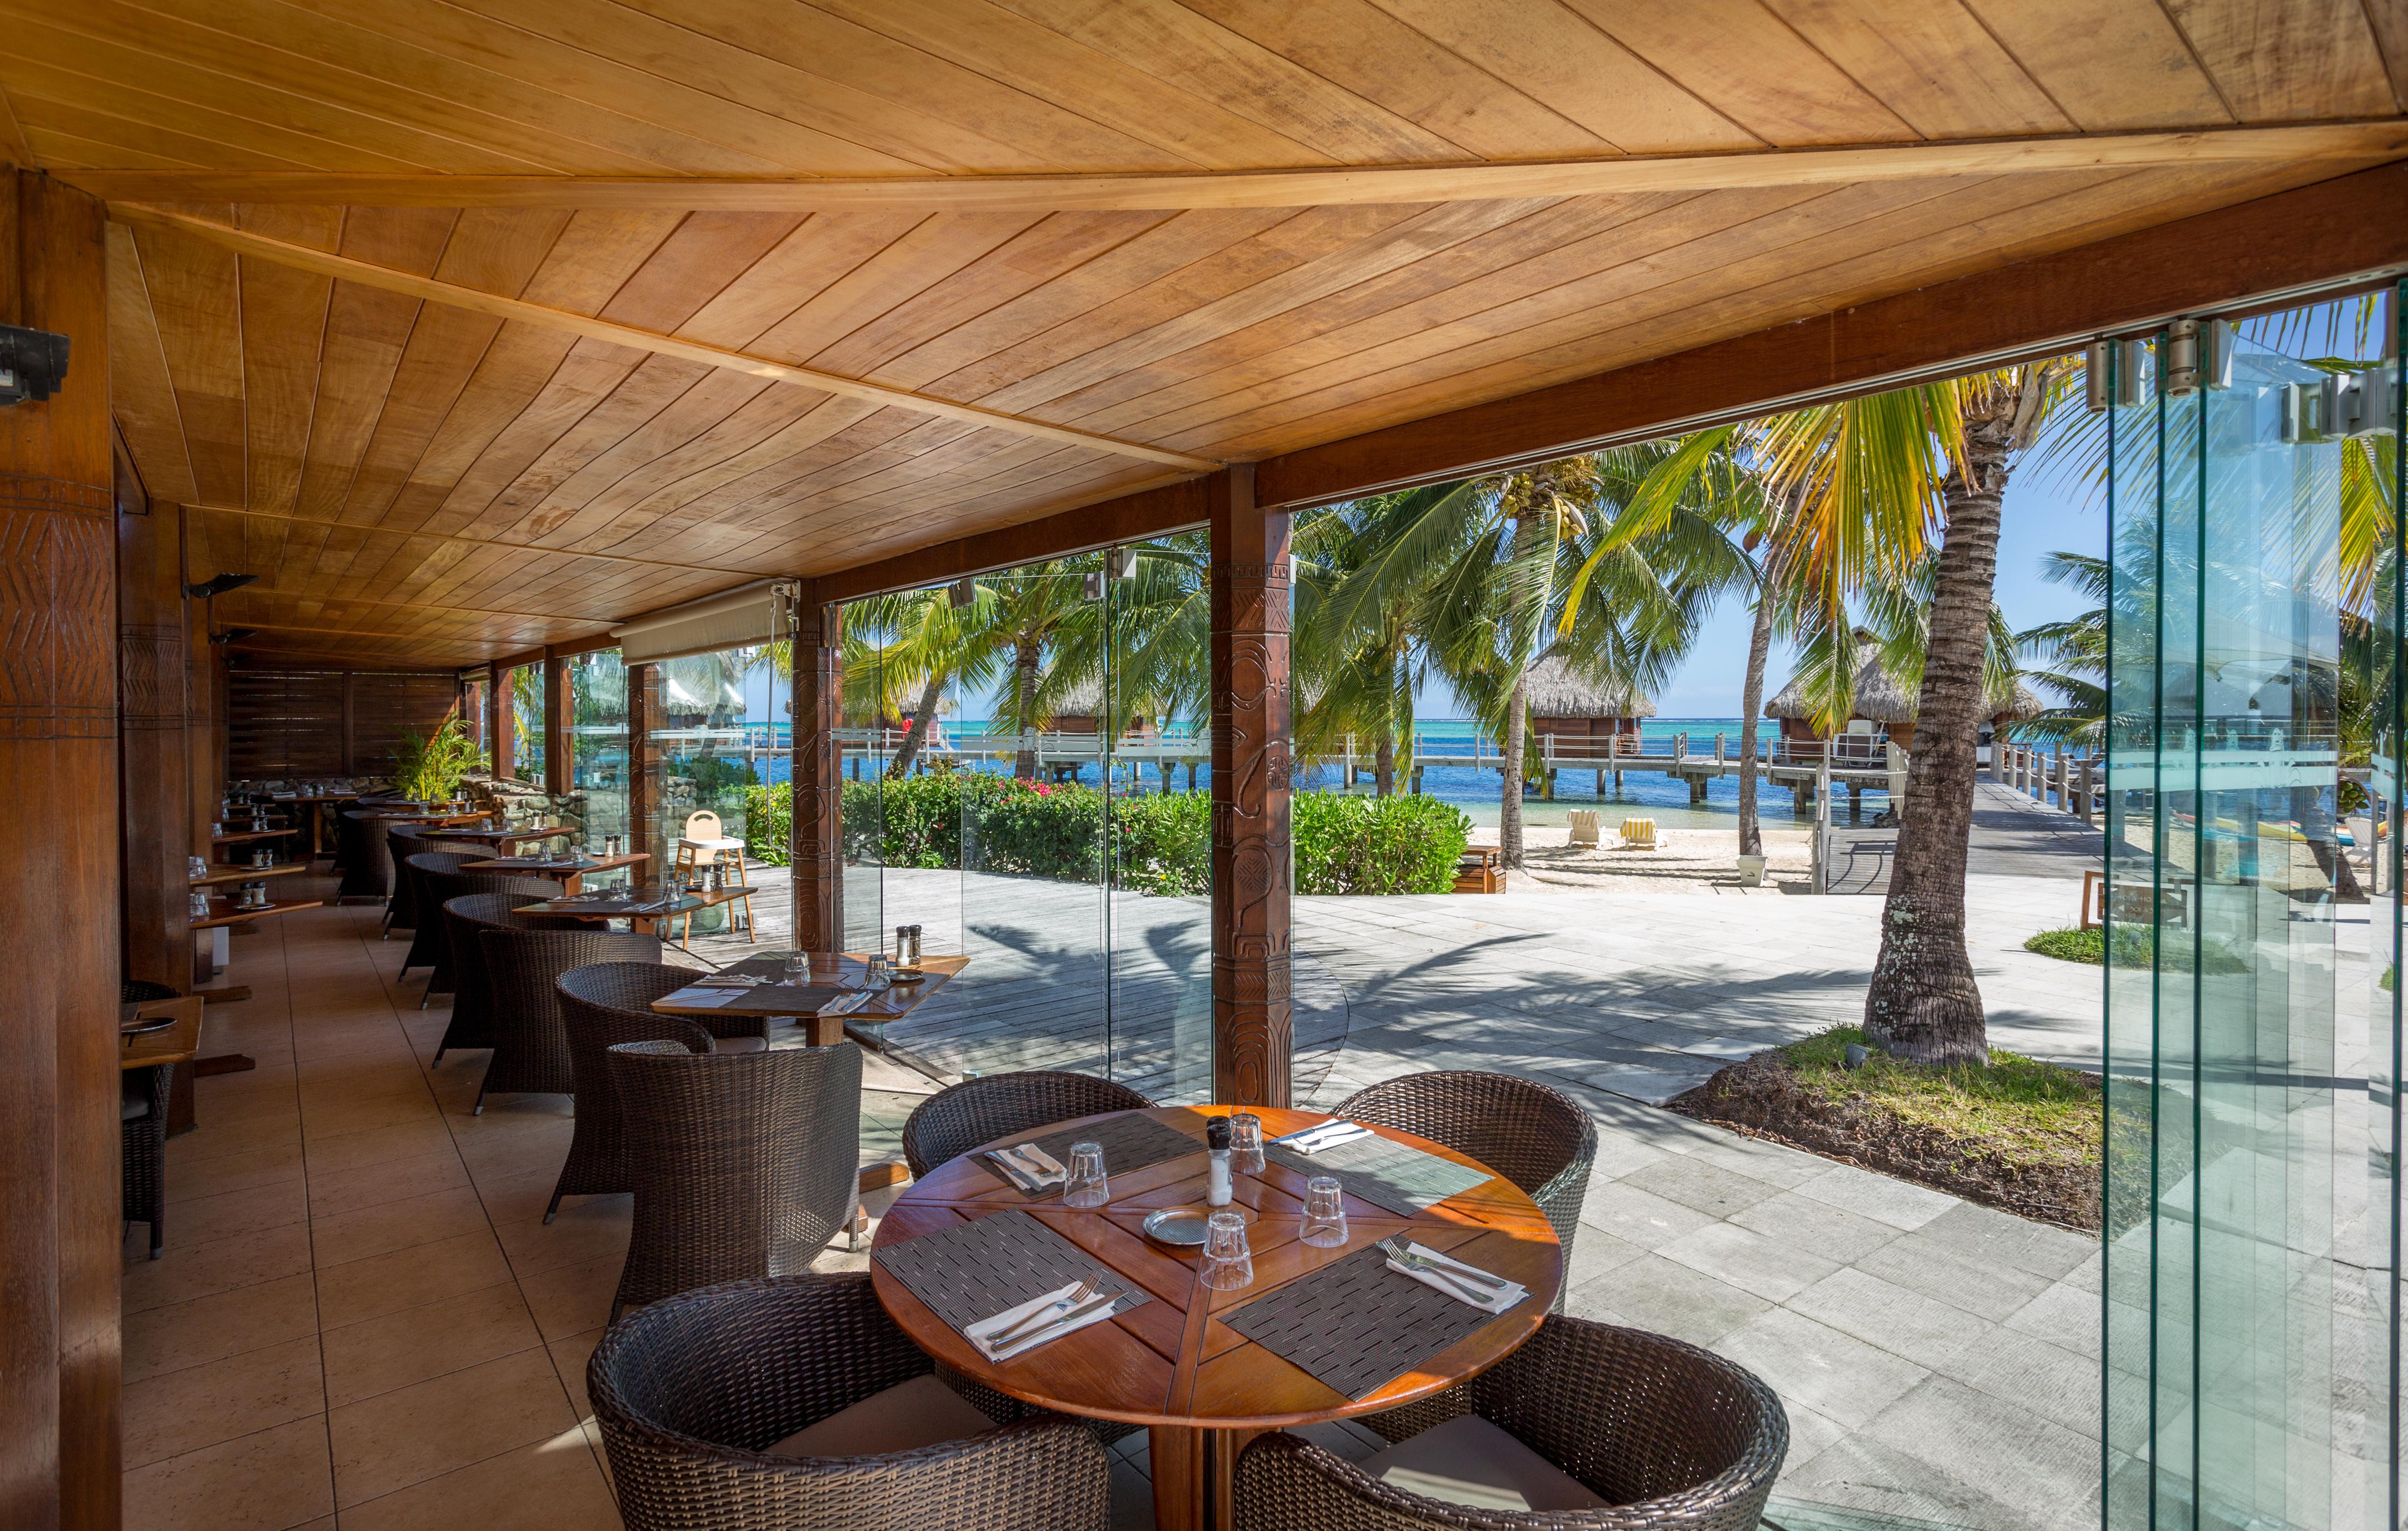 https://tahititourisme.be/wp-content/uploads/2018/03/RESTAURATION-Restaurant-Mahanai-1-Charles_Veronese.jpg